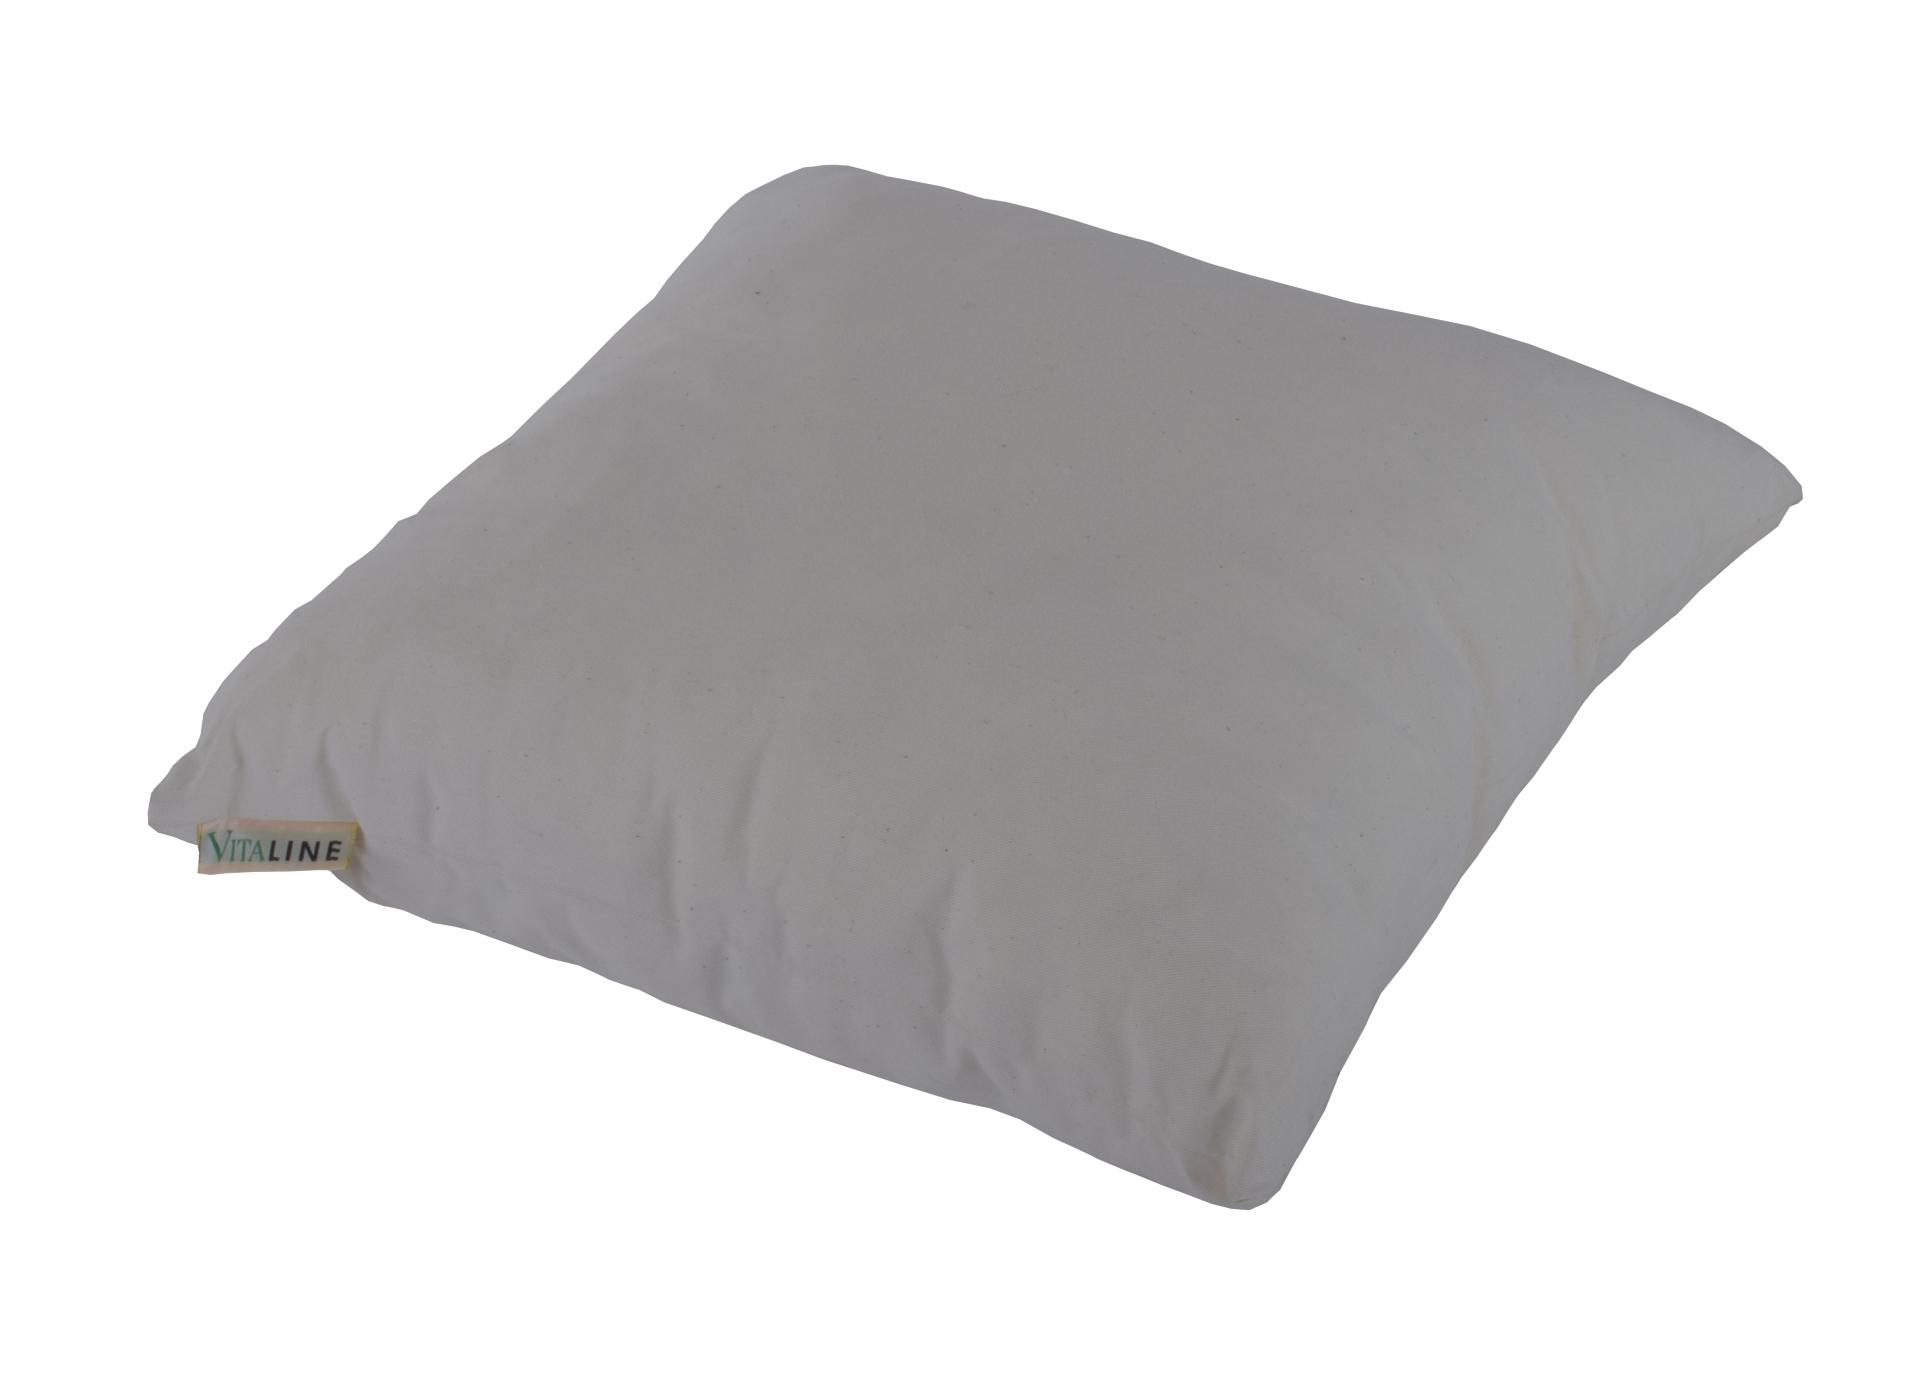 natur latex kissen 40 x 40 x 14 cm ebay. Black Bedroom Furniture Sets. Home Design Ideas